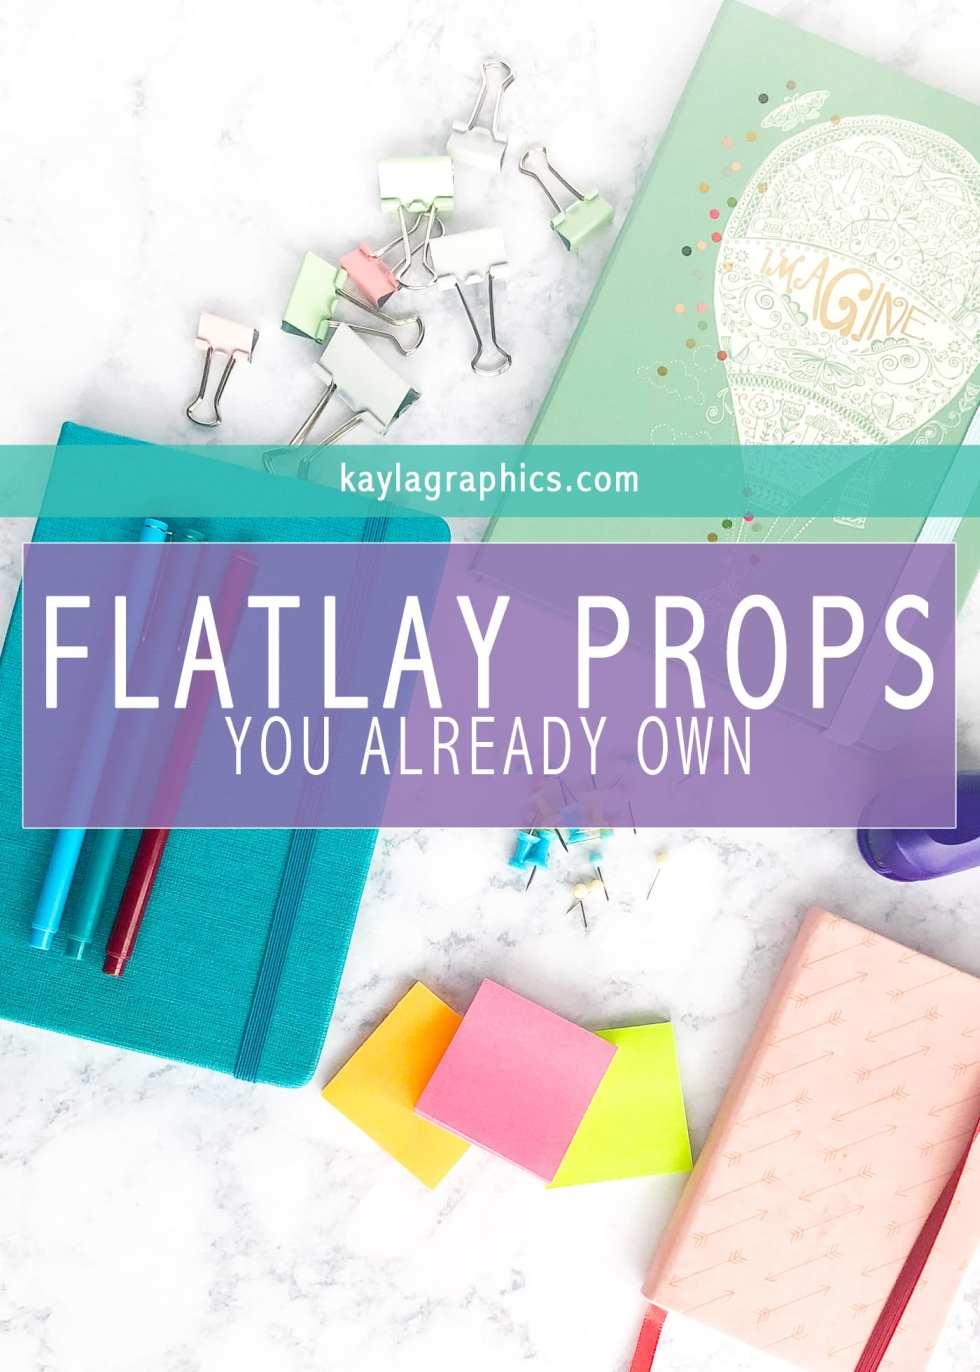 Flatlay Props You Already Own